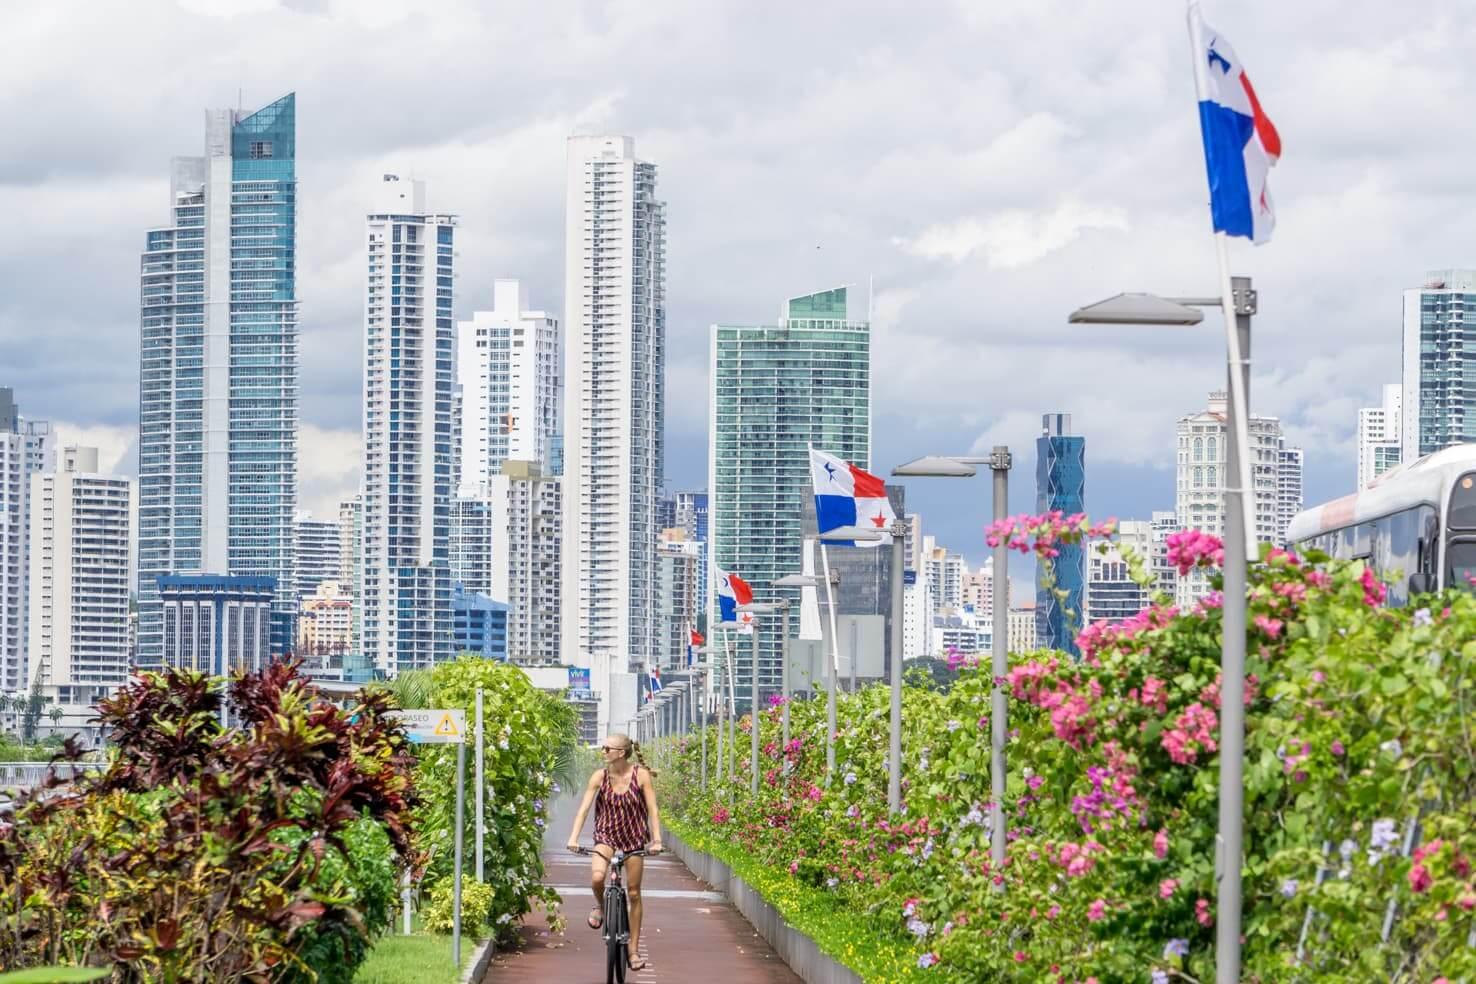 biking in Panama City, Panama